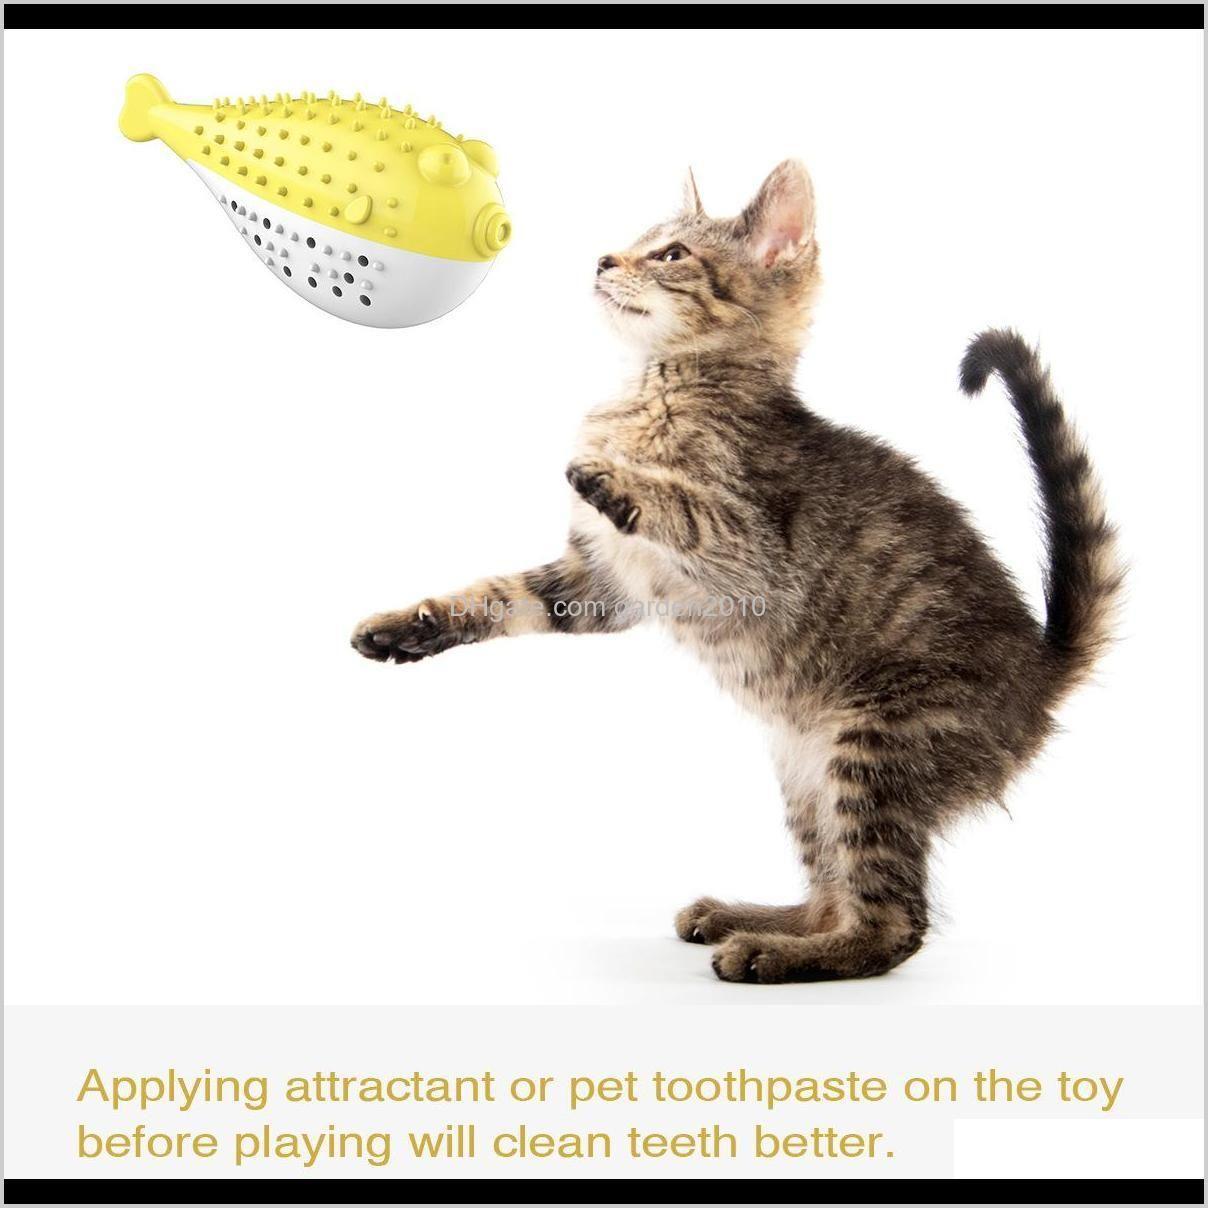 dolphin mint odontoprisis simulation fish catnip cat toys clean teethbrush resistance to bite cat toys & chews dog pet supplies ha291